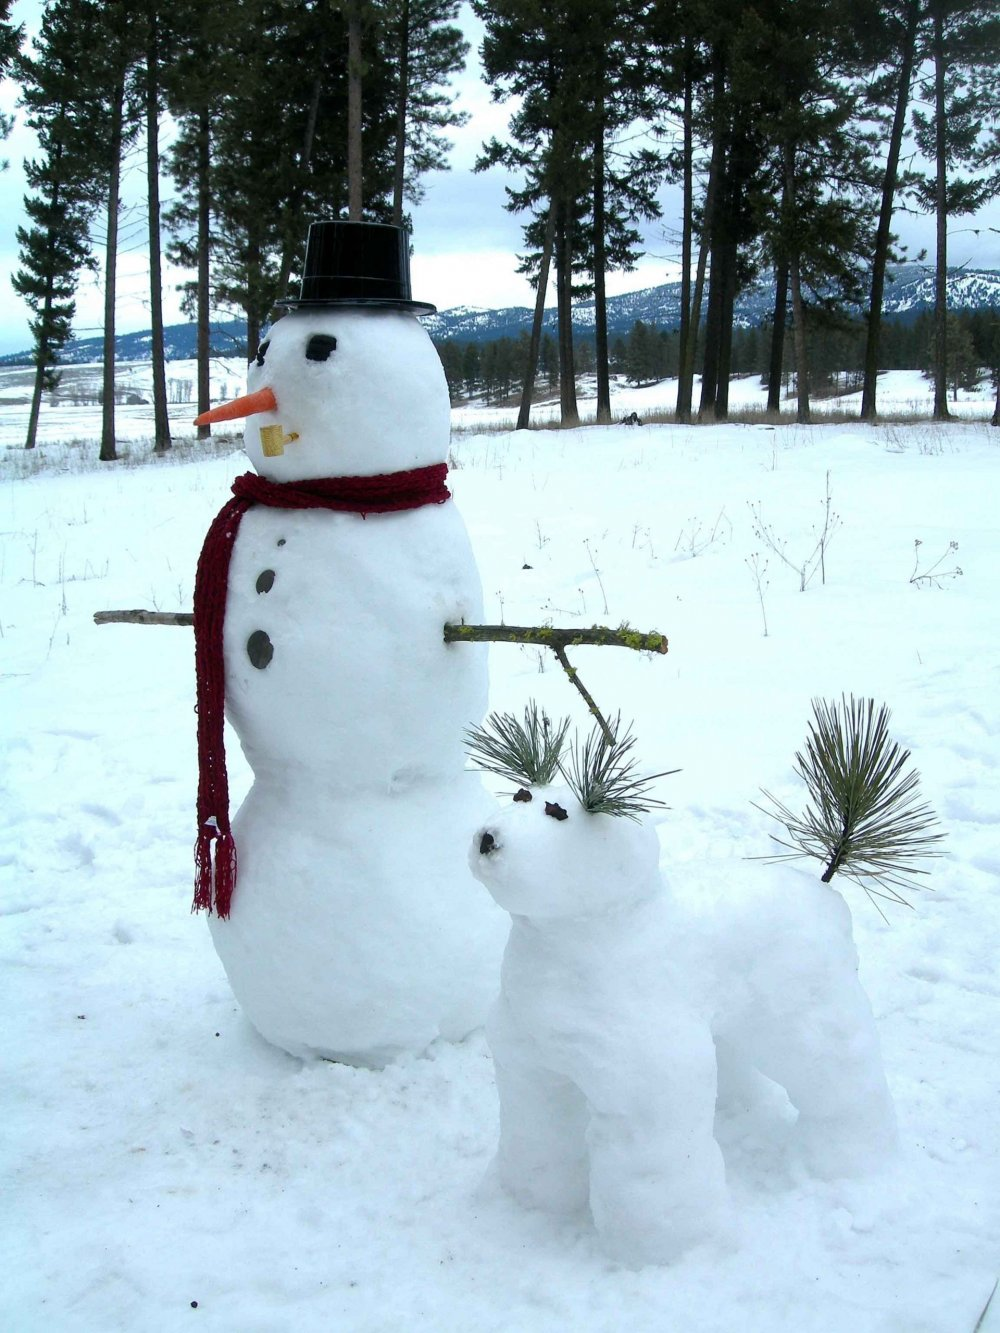 Poodle Snow LUMPS-snowman-snowdog-snowmen-13384498-1920-2560.jpg